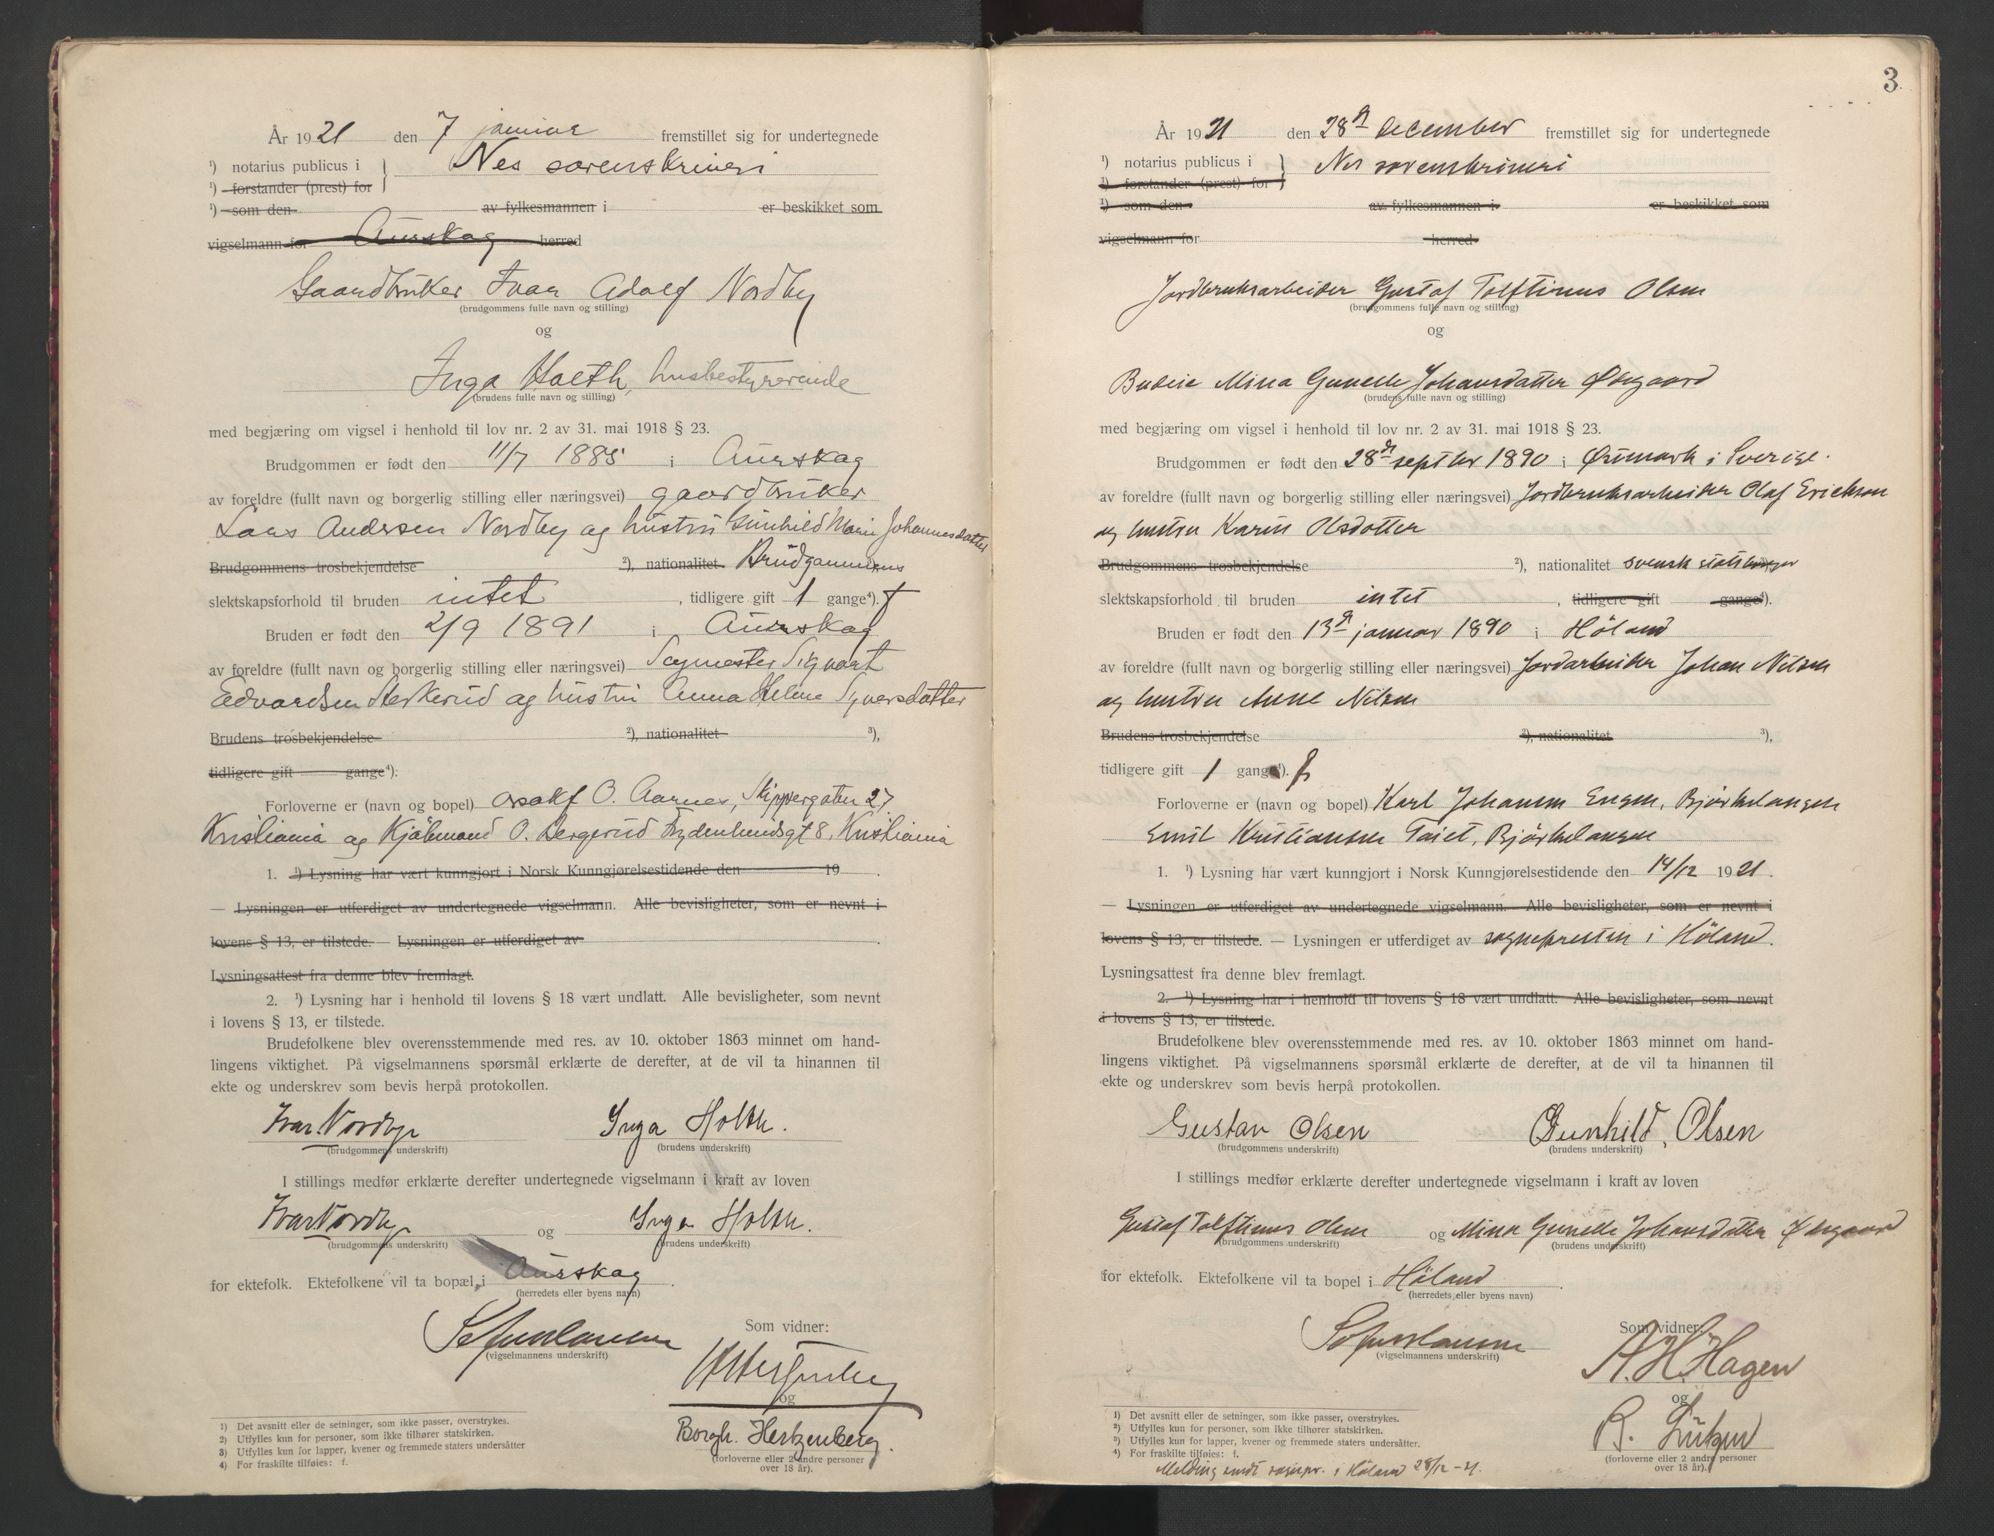 SAO, Nes tingrett, L/Lc/Lca/L0001: Vigselbok, 1920-1943, s. 3